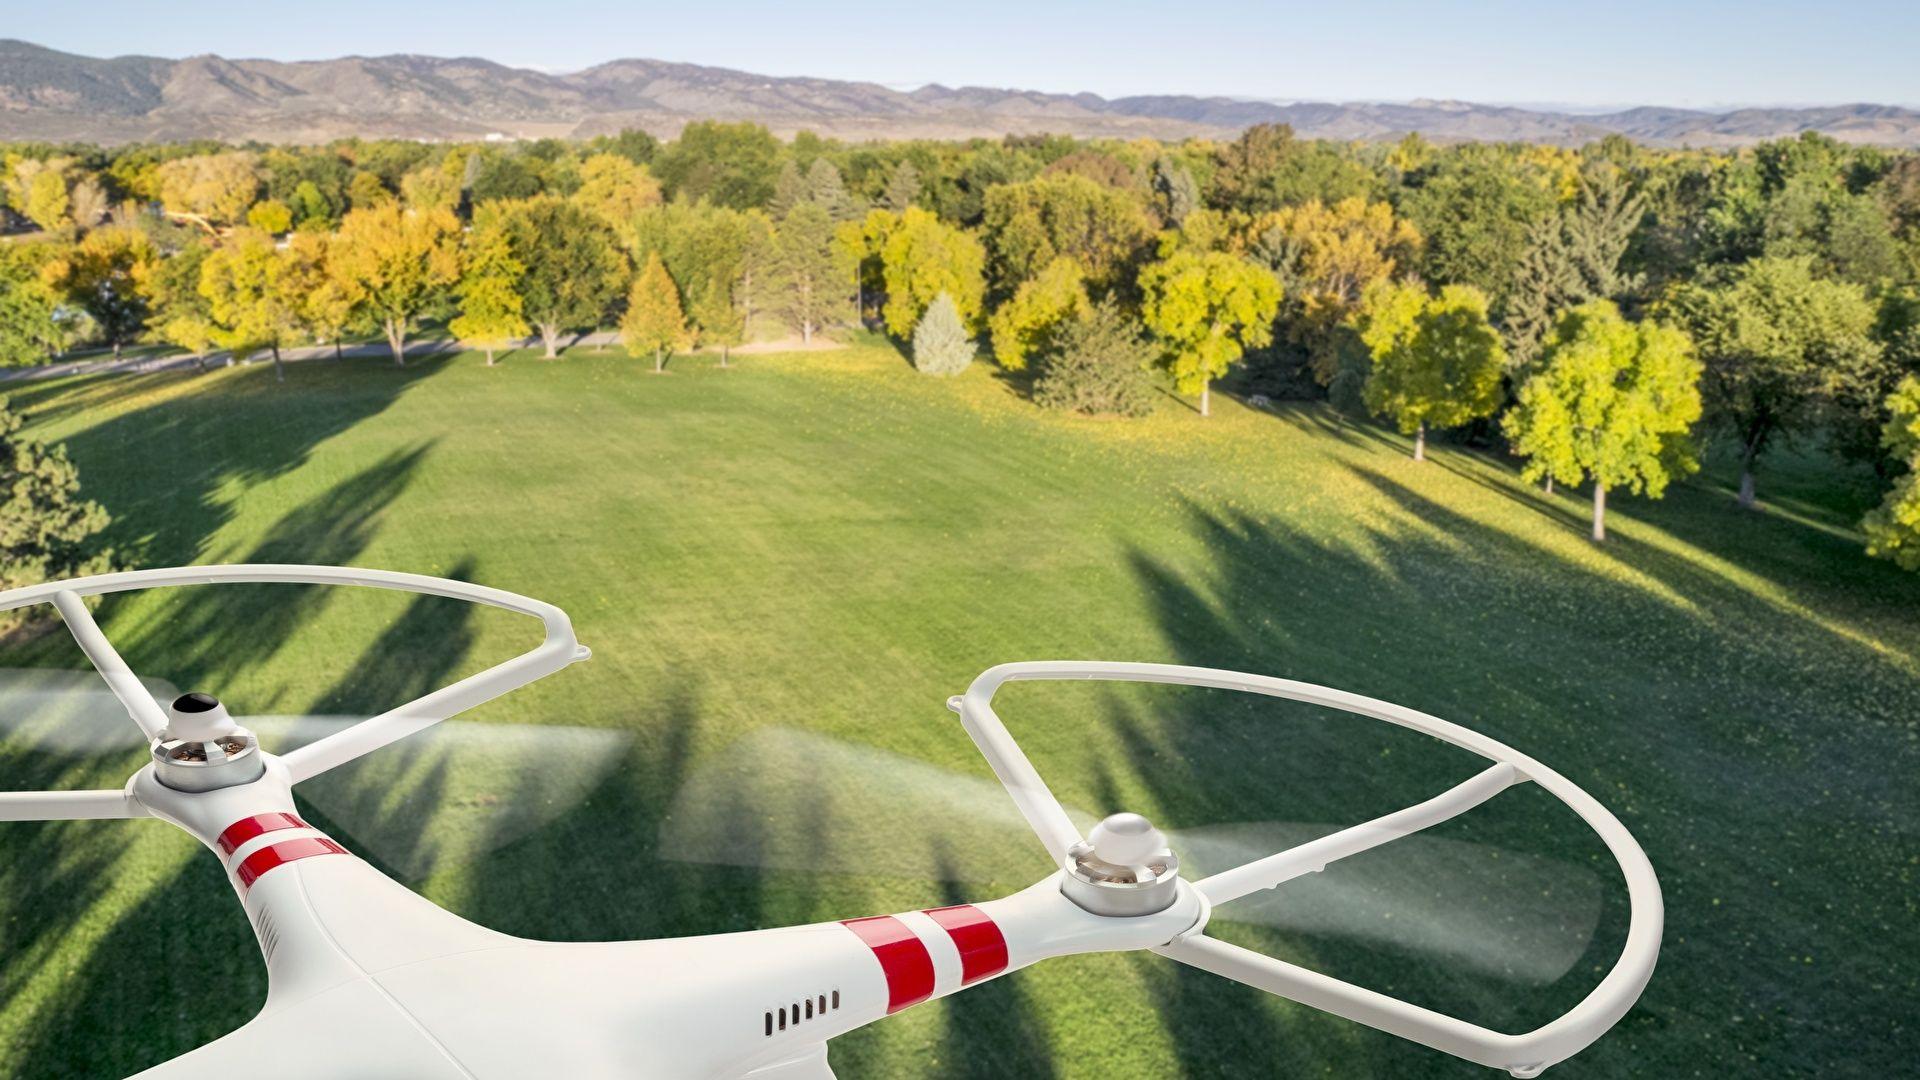 Drone full screen hd wallpaper